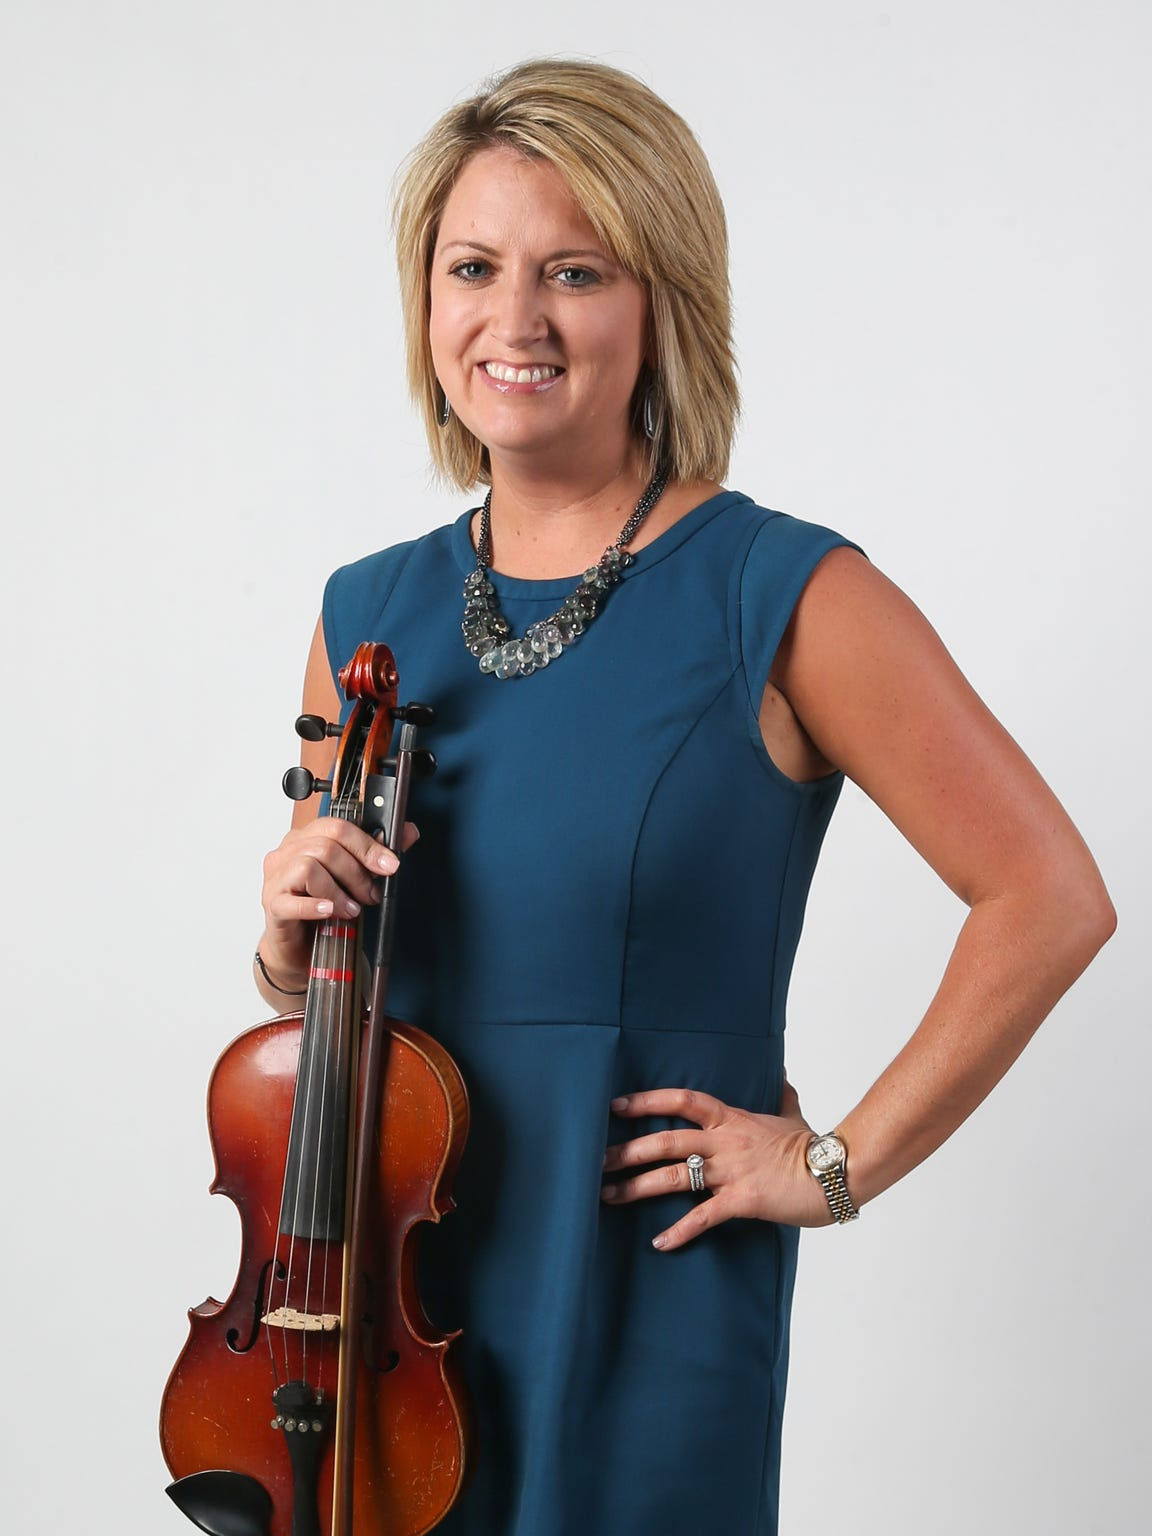 Courtney Mahaffey, Executive Director of San Angelo